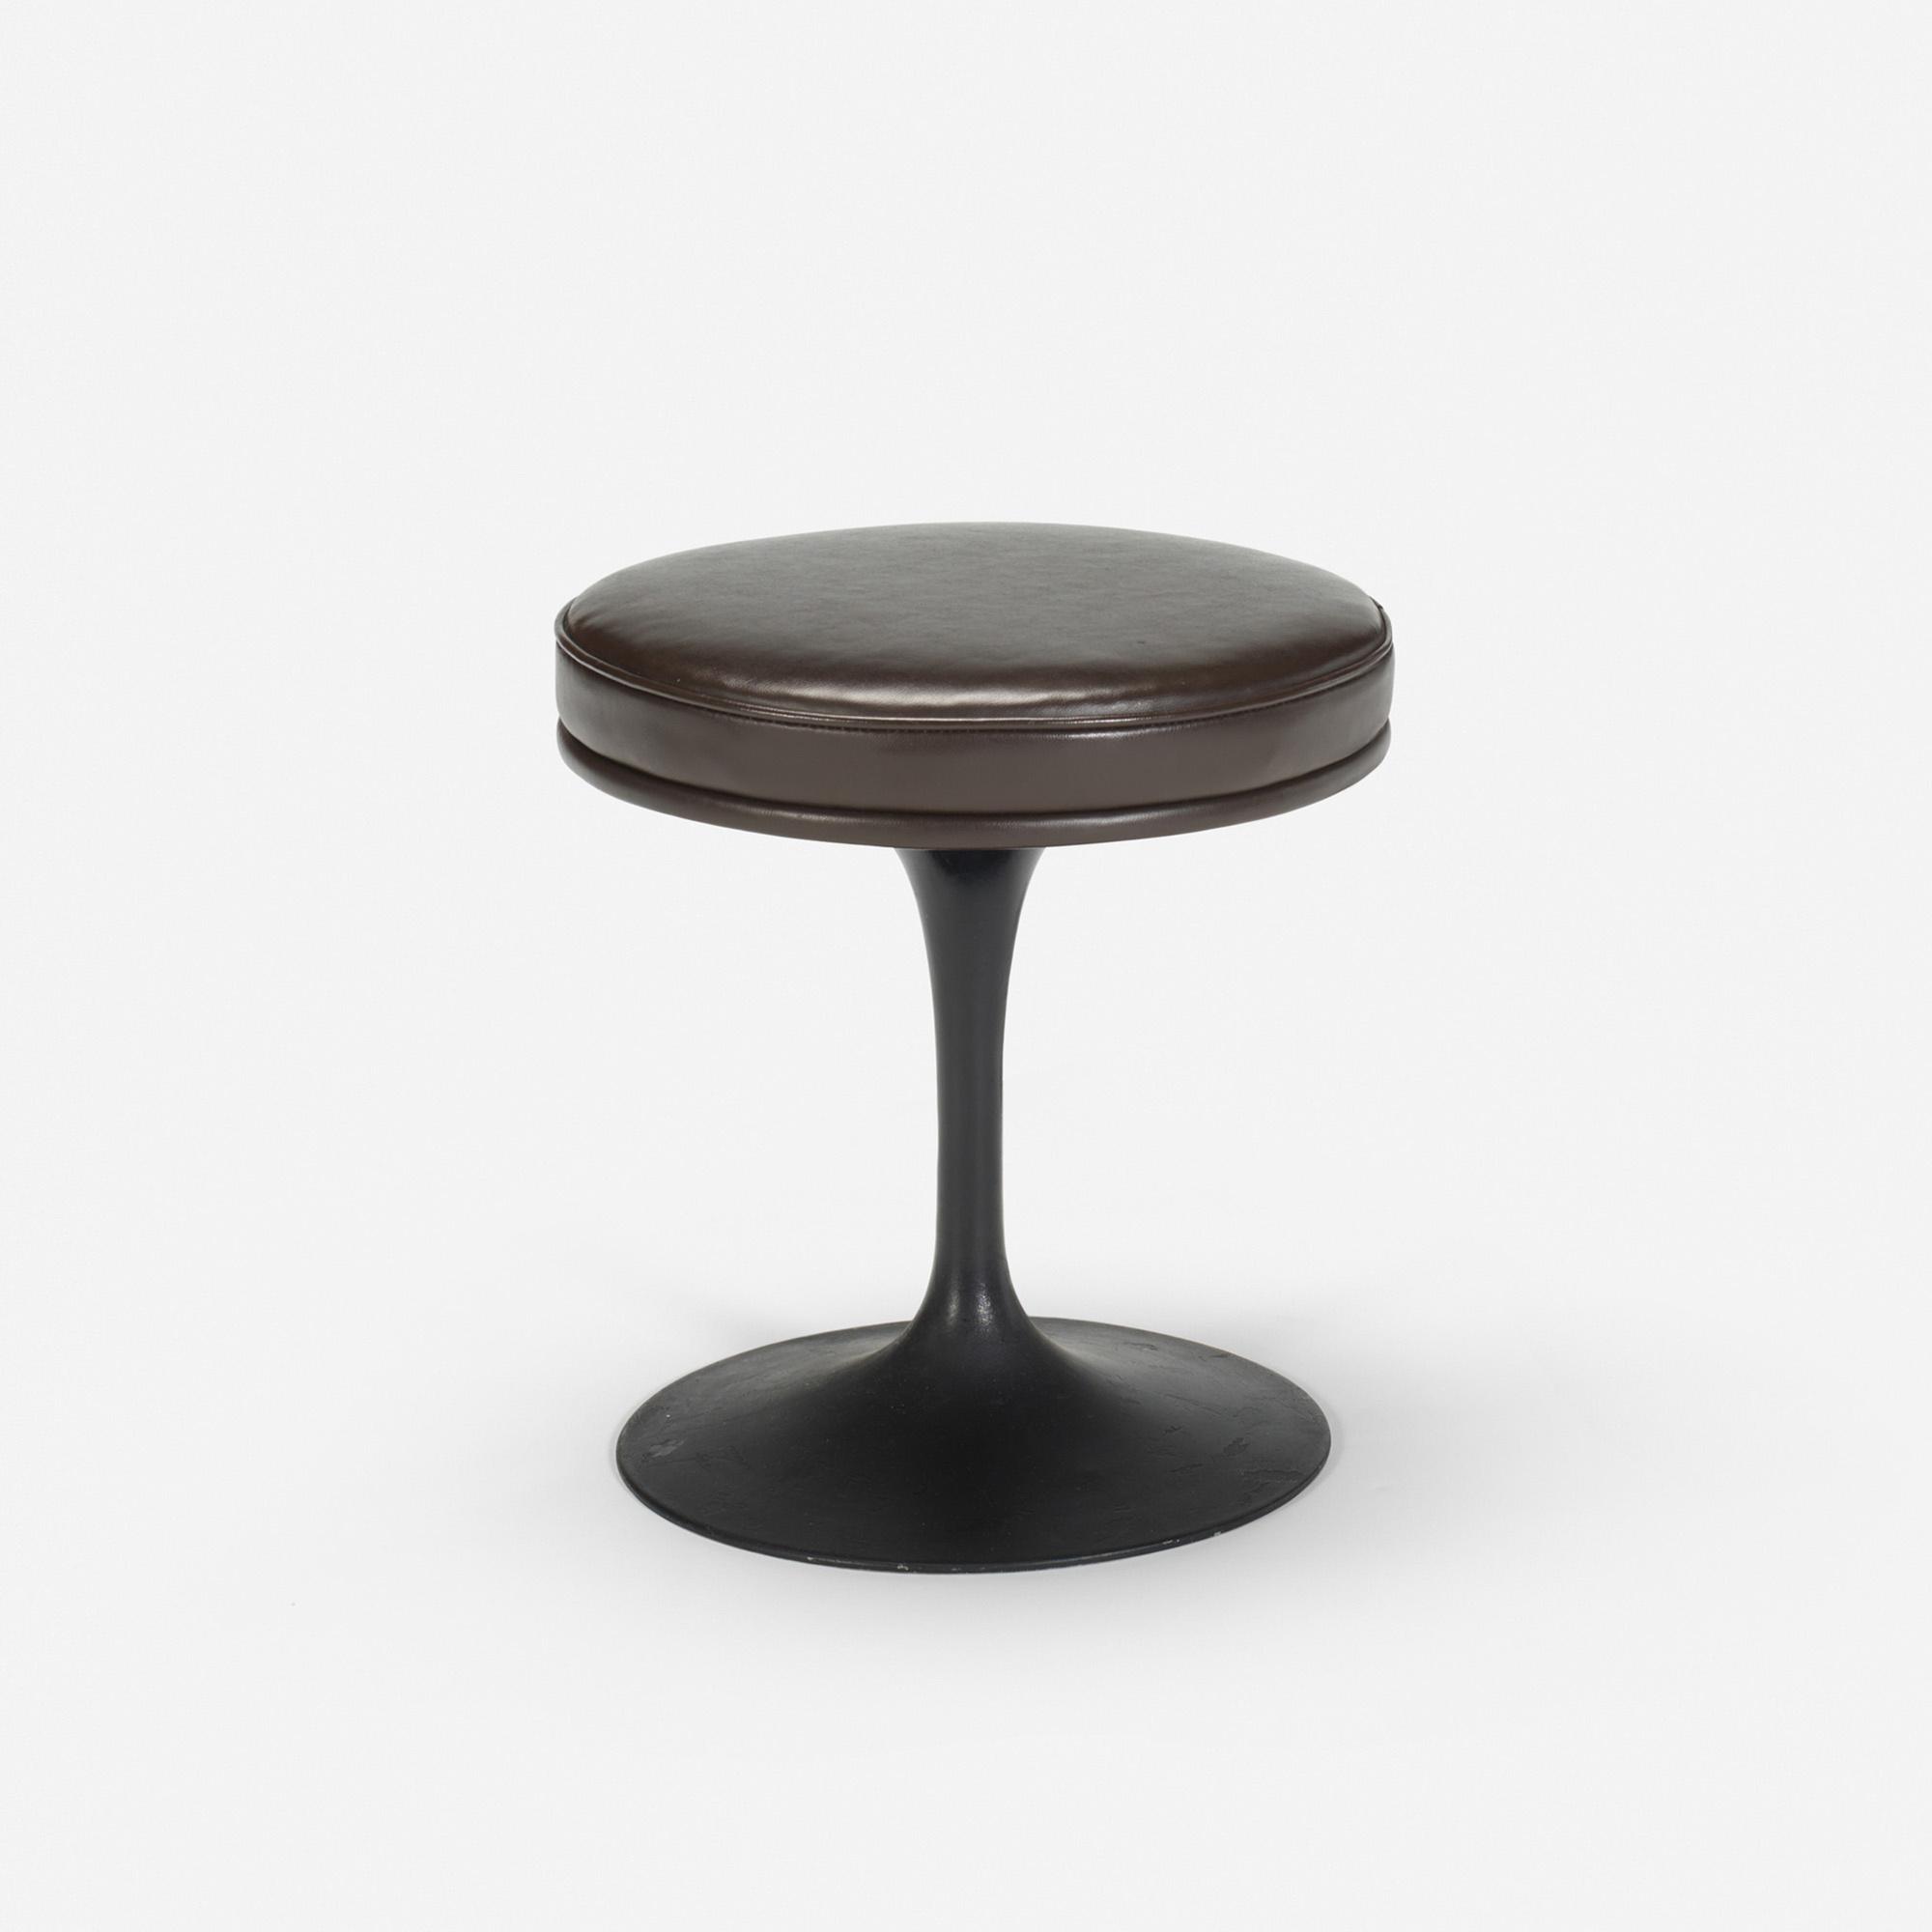 126: Eero Saarinen / Tulip stool from the bar of the Grill Room (1 of 1)